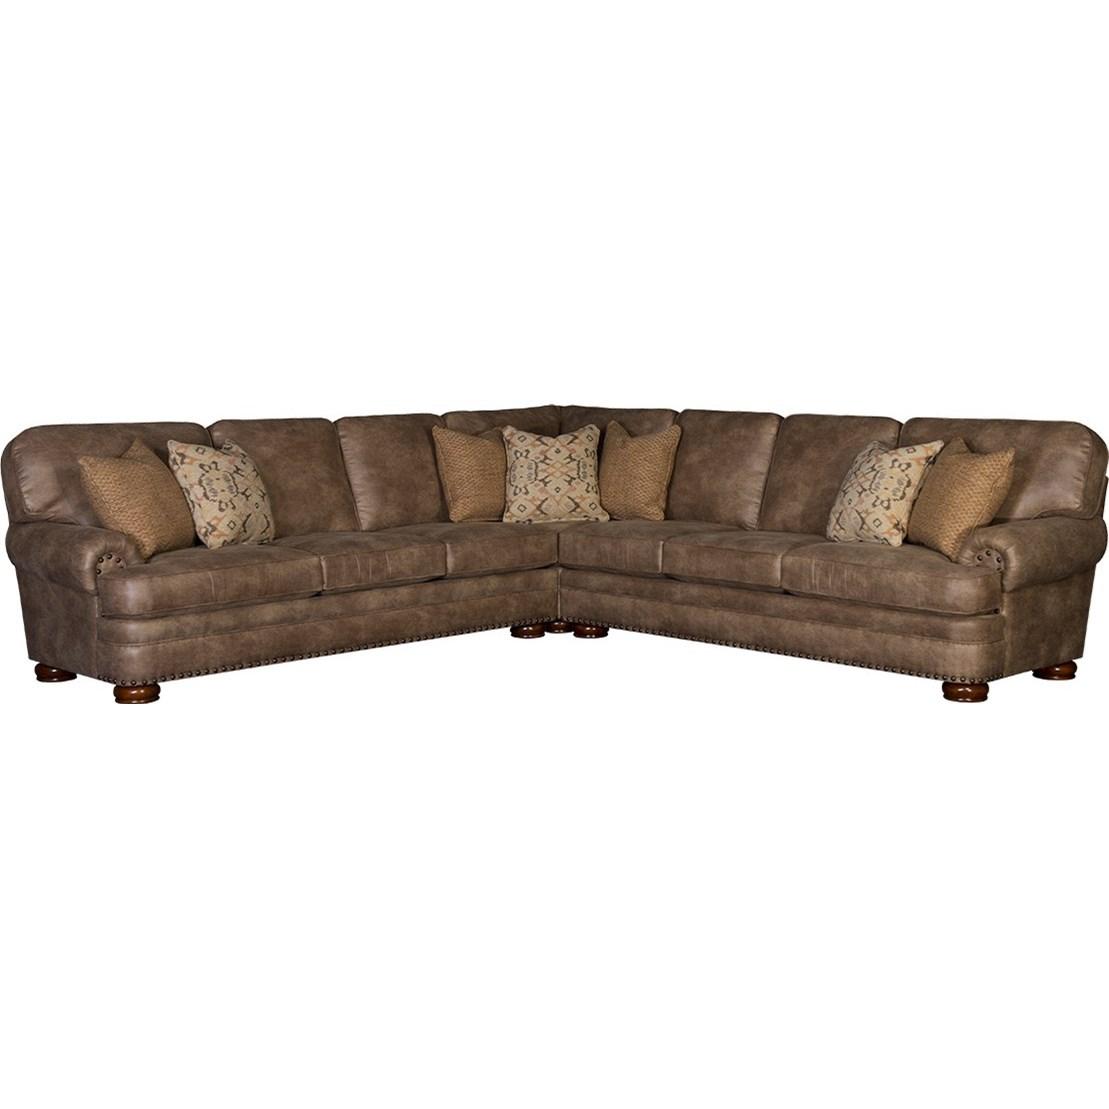 mayo 3620 six seat sectional sofa